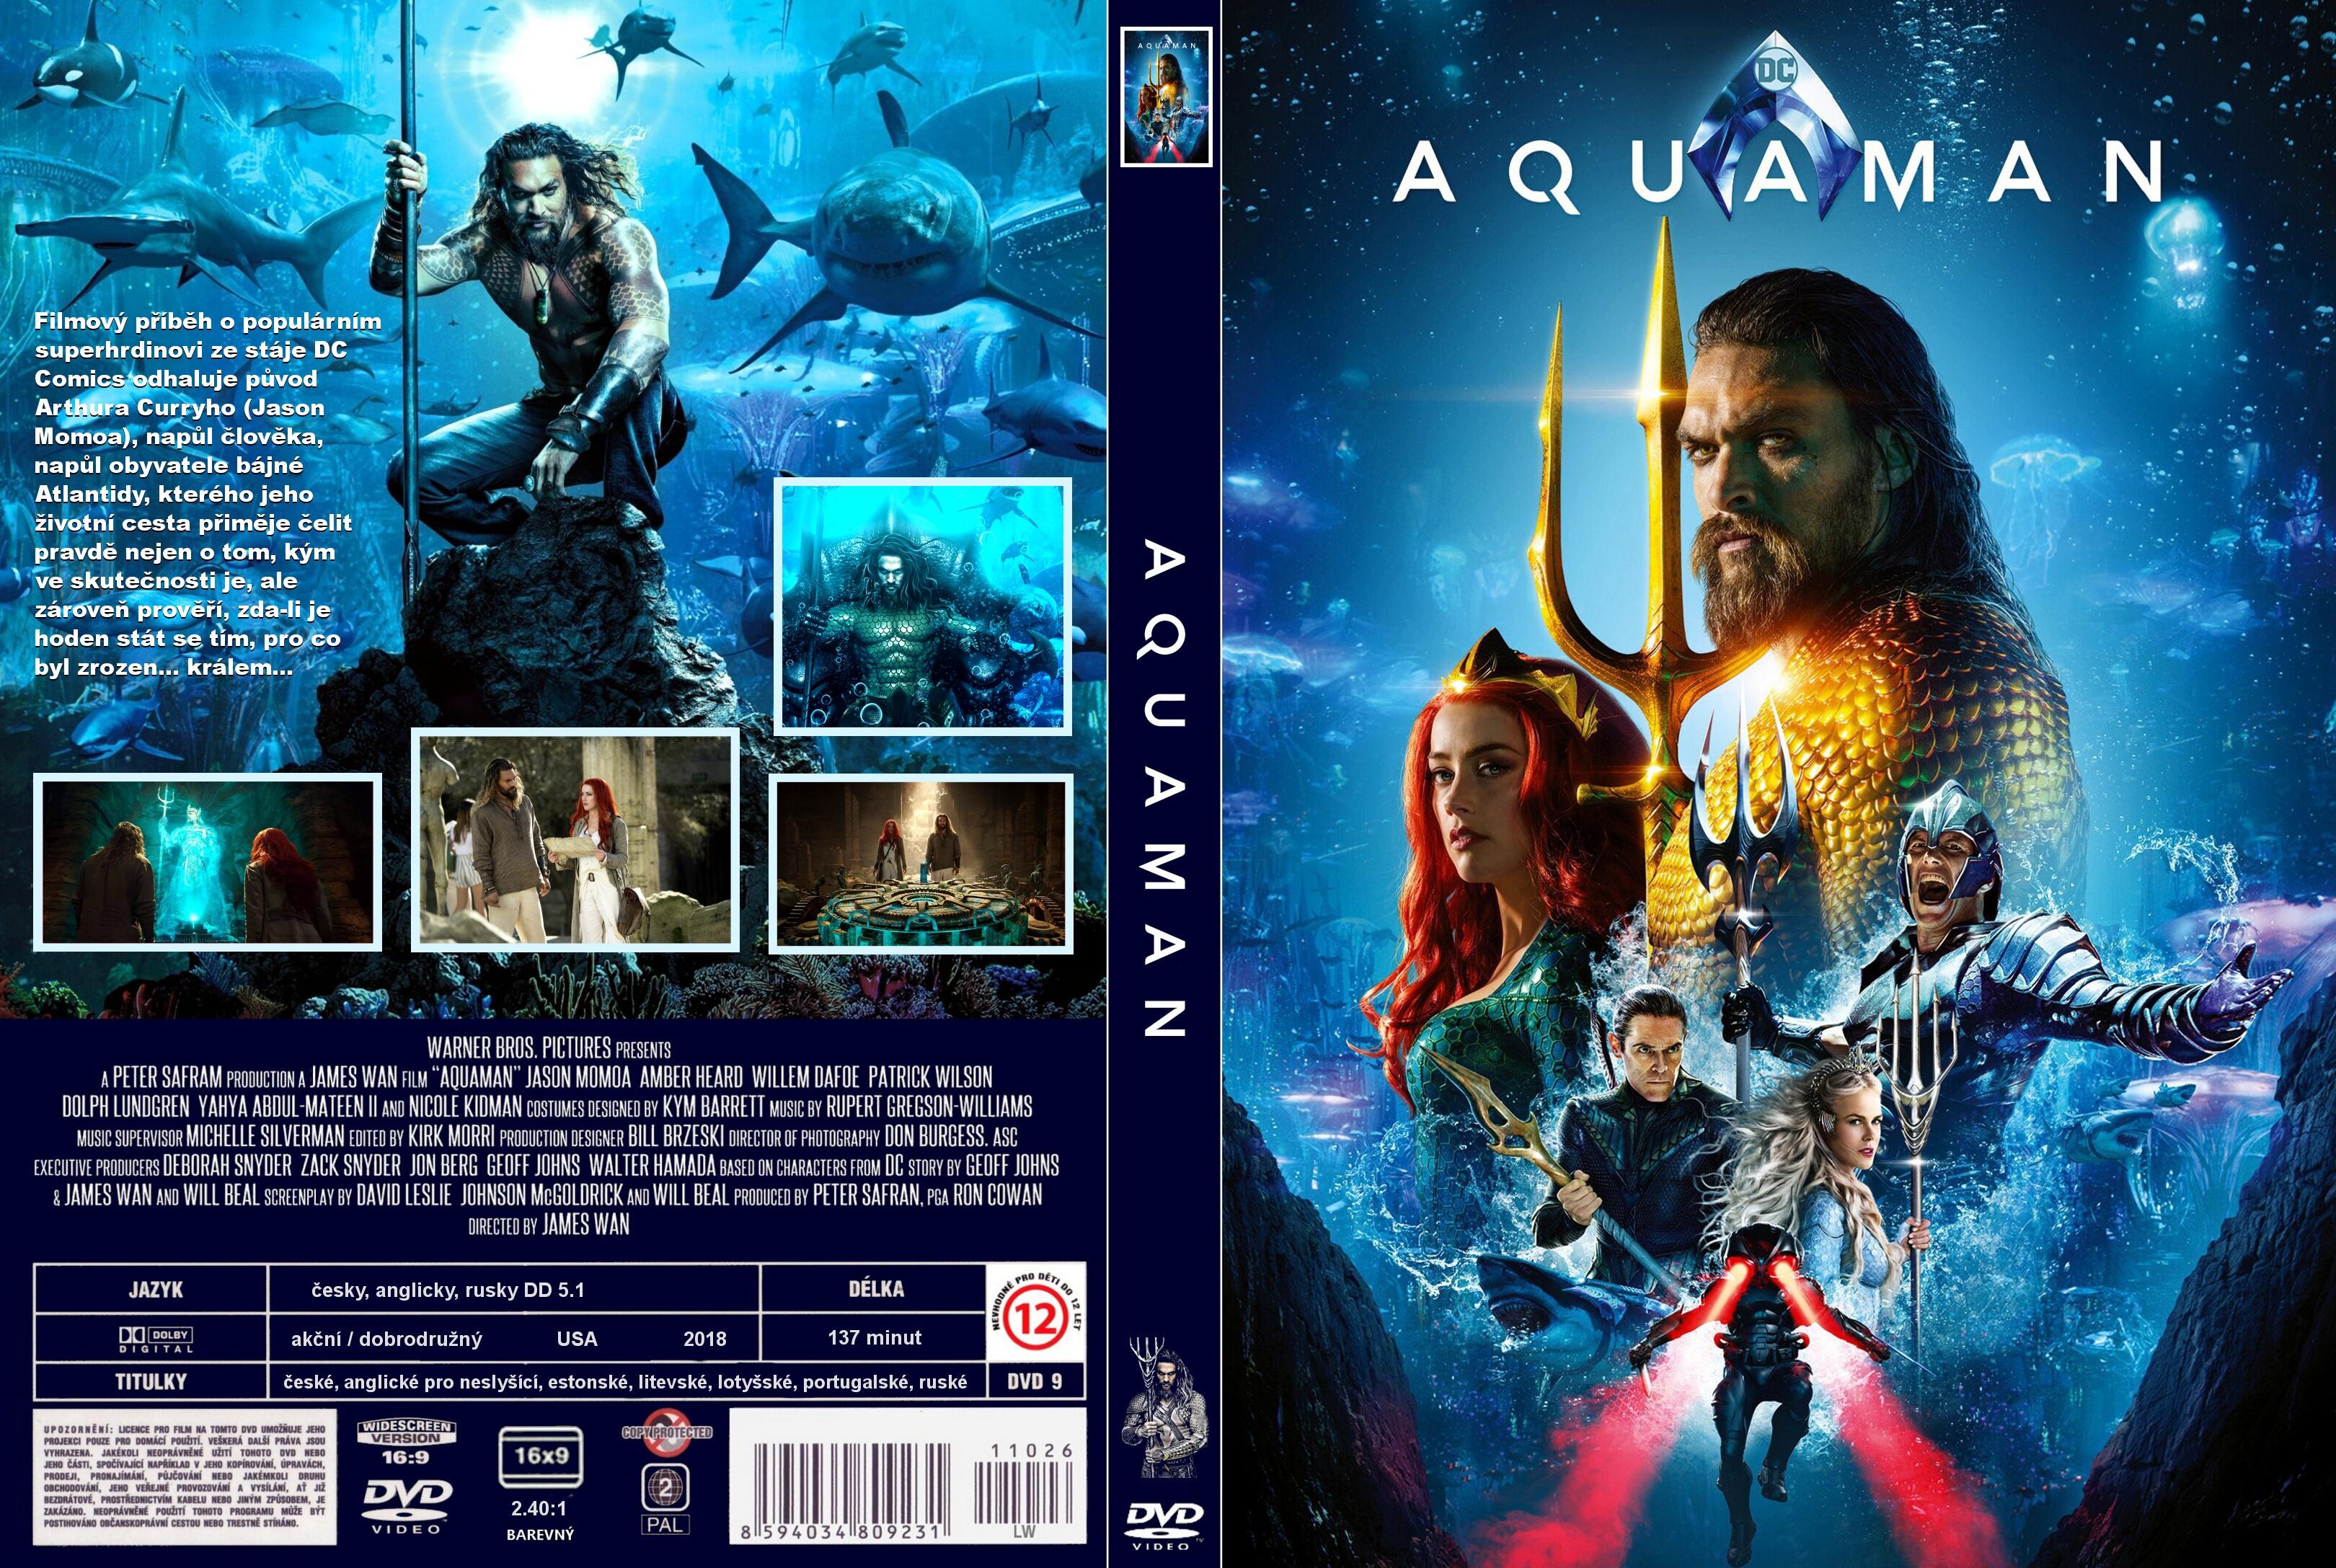 Covers Box Sk Aquaman 2018 High Quality Dvd Blueray Movie